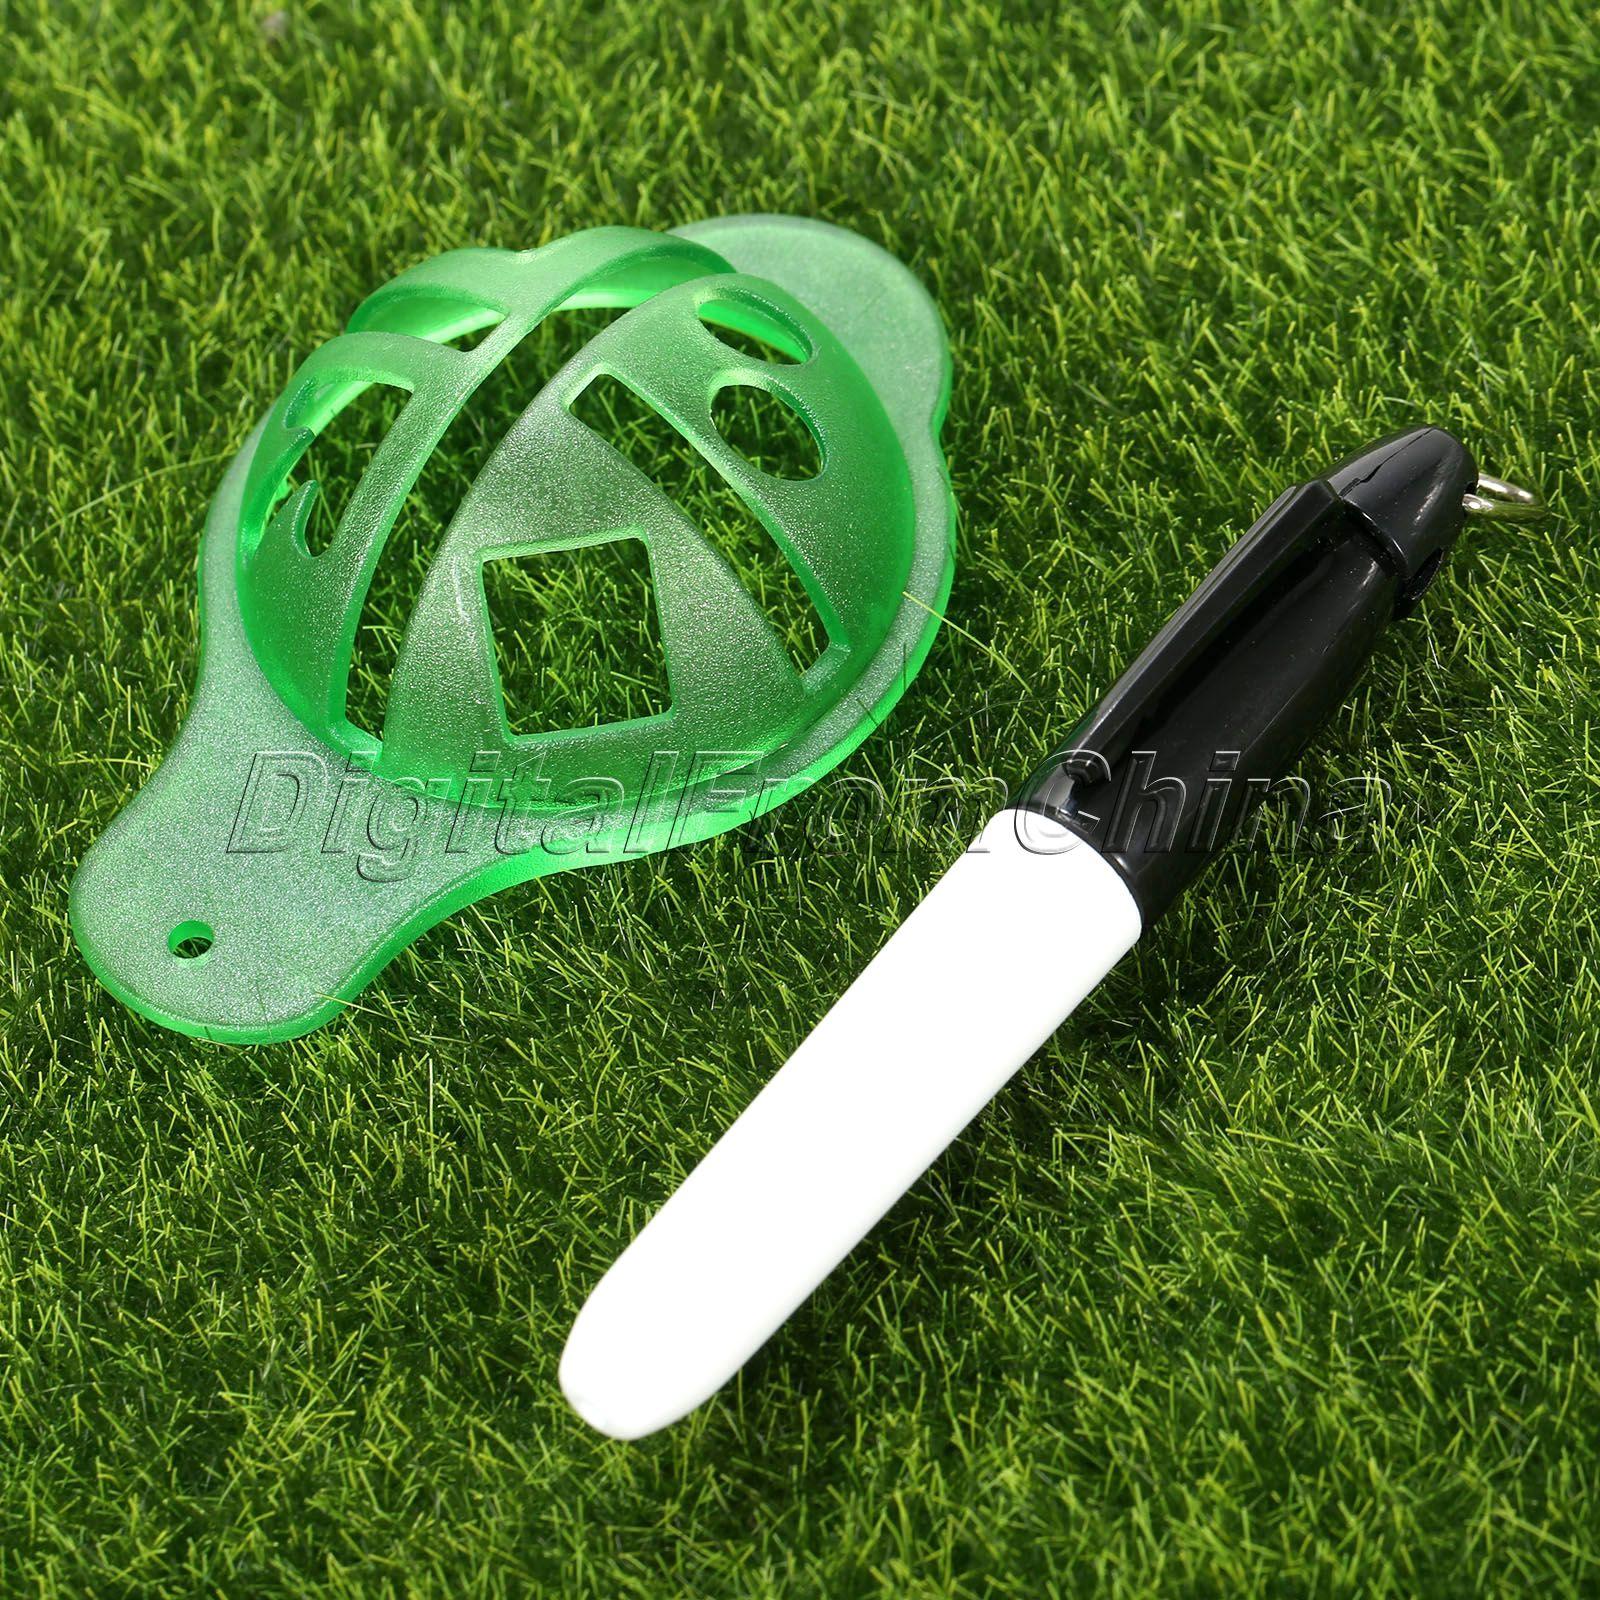 gohantee Golf Ball Liner Marcator Pen Ball Strokes Golf Formare SIDA - Golf - Fotografie 5